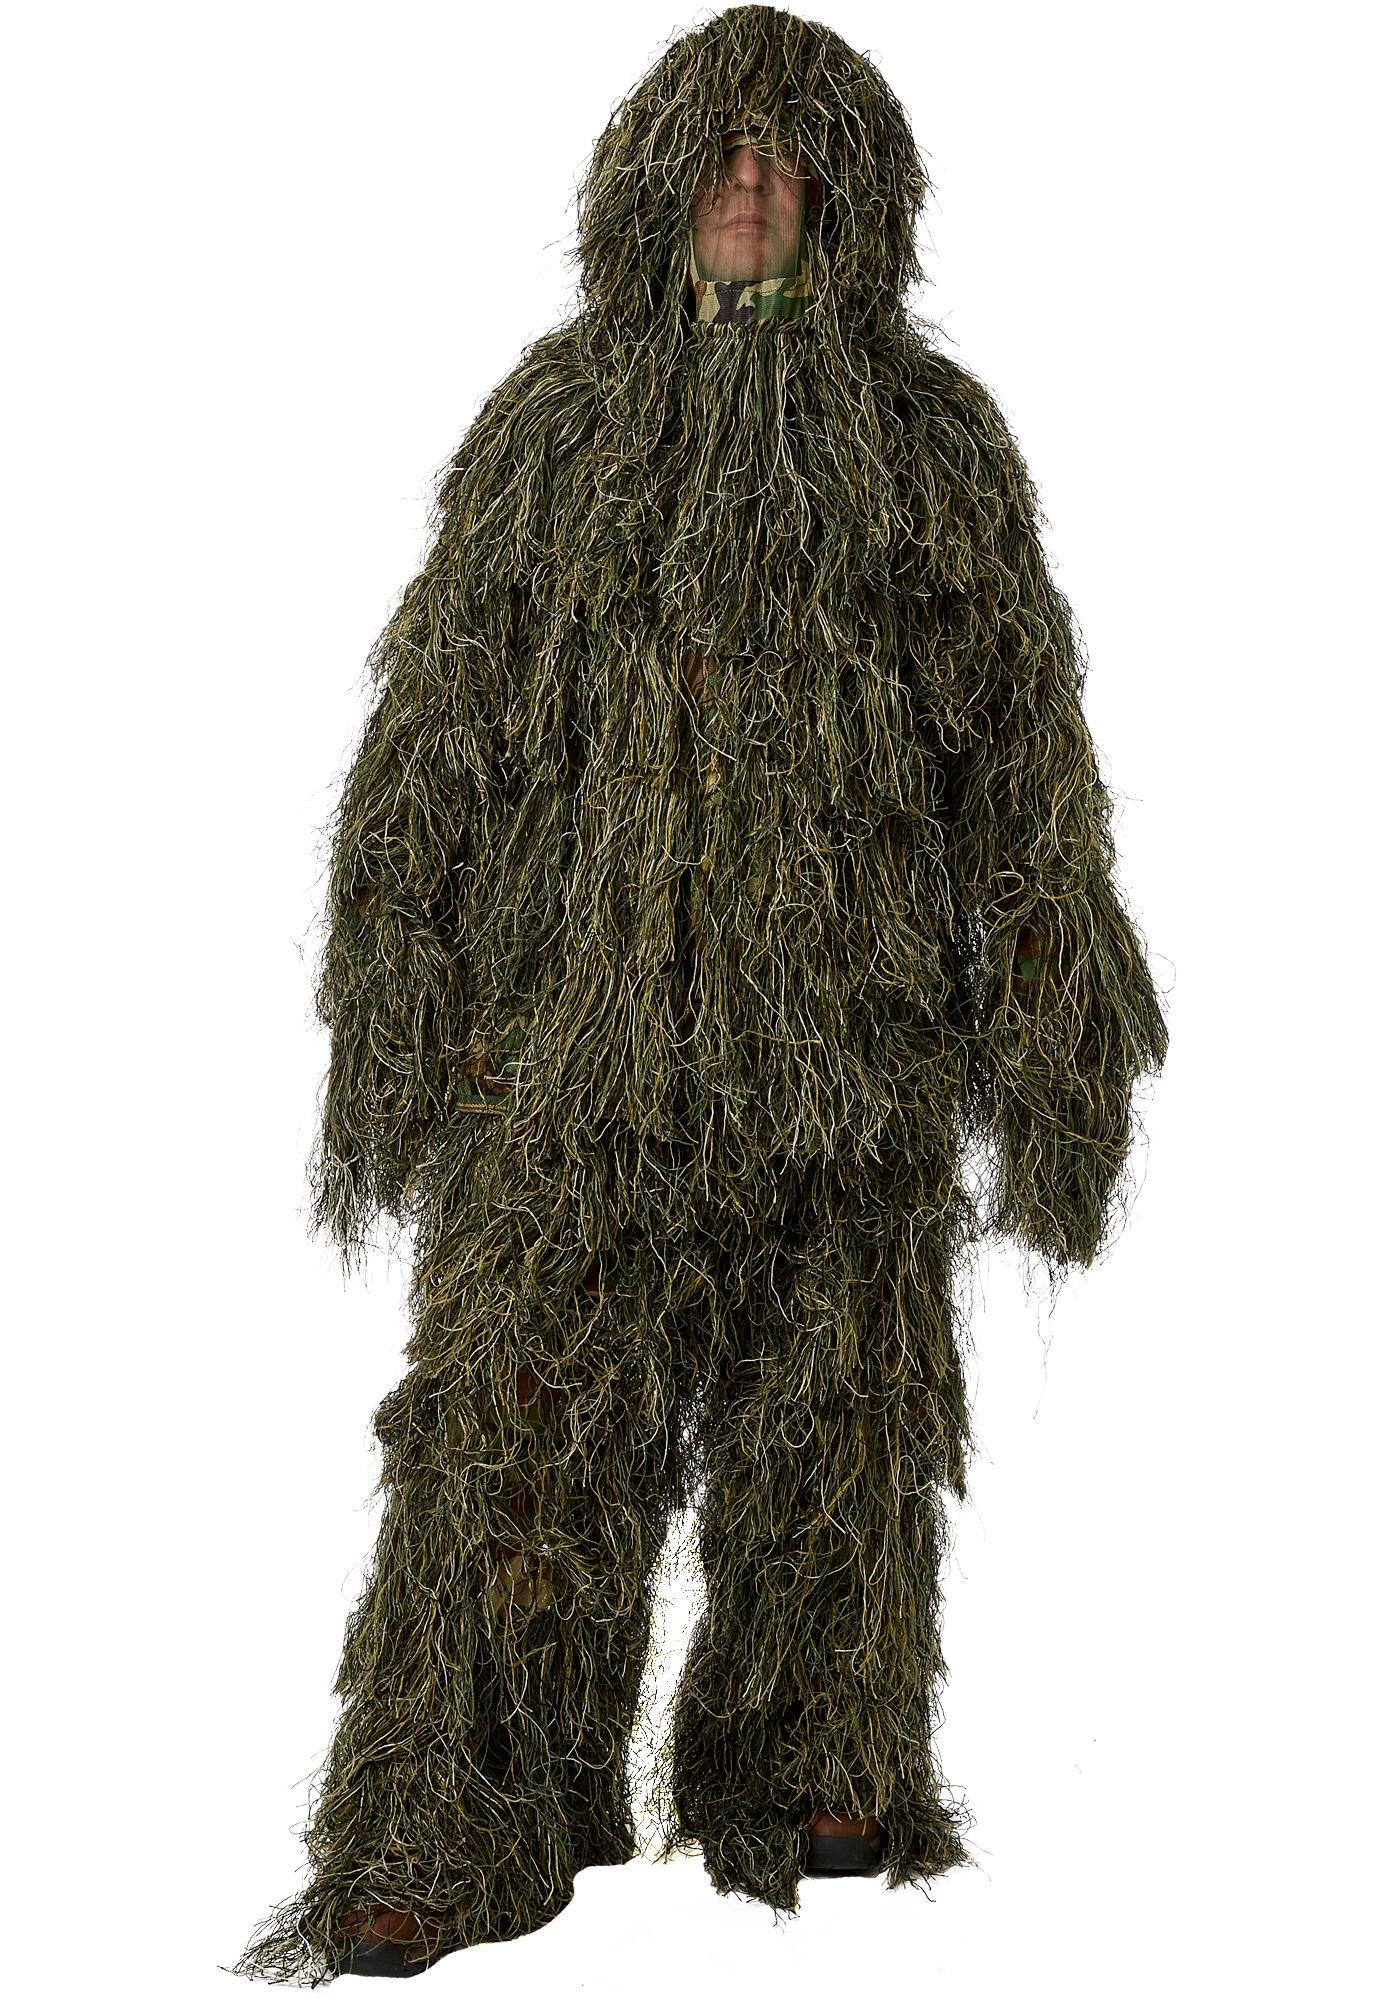 Field & Stream Men's Ghillie Suit